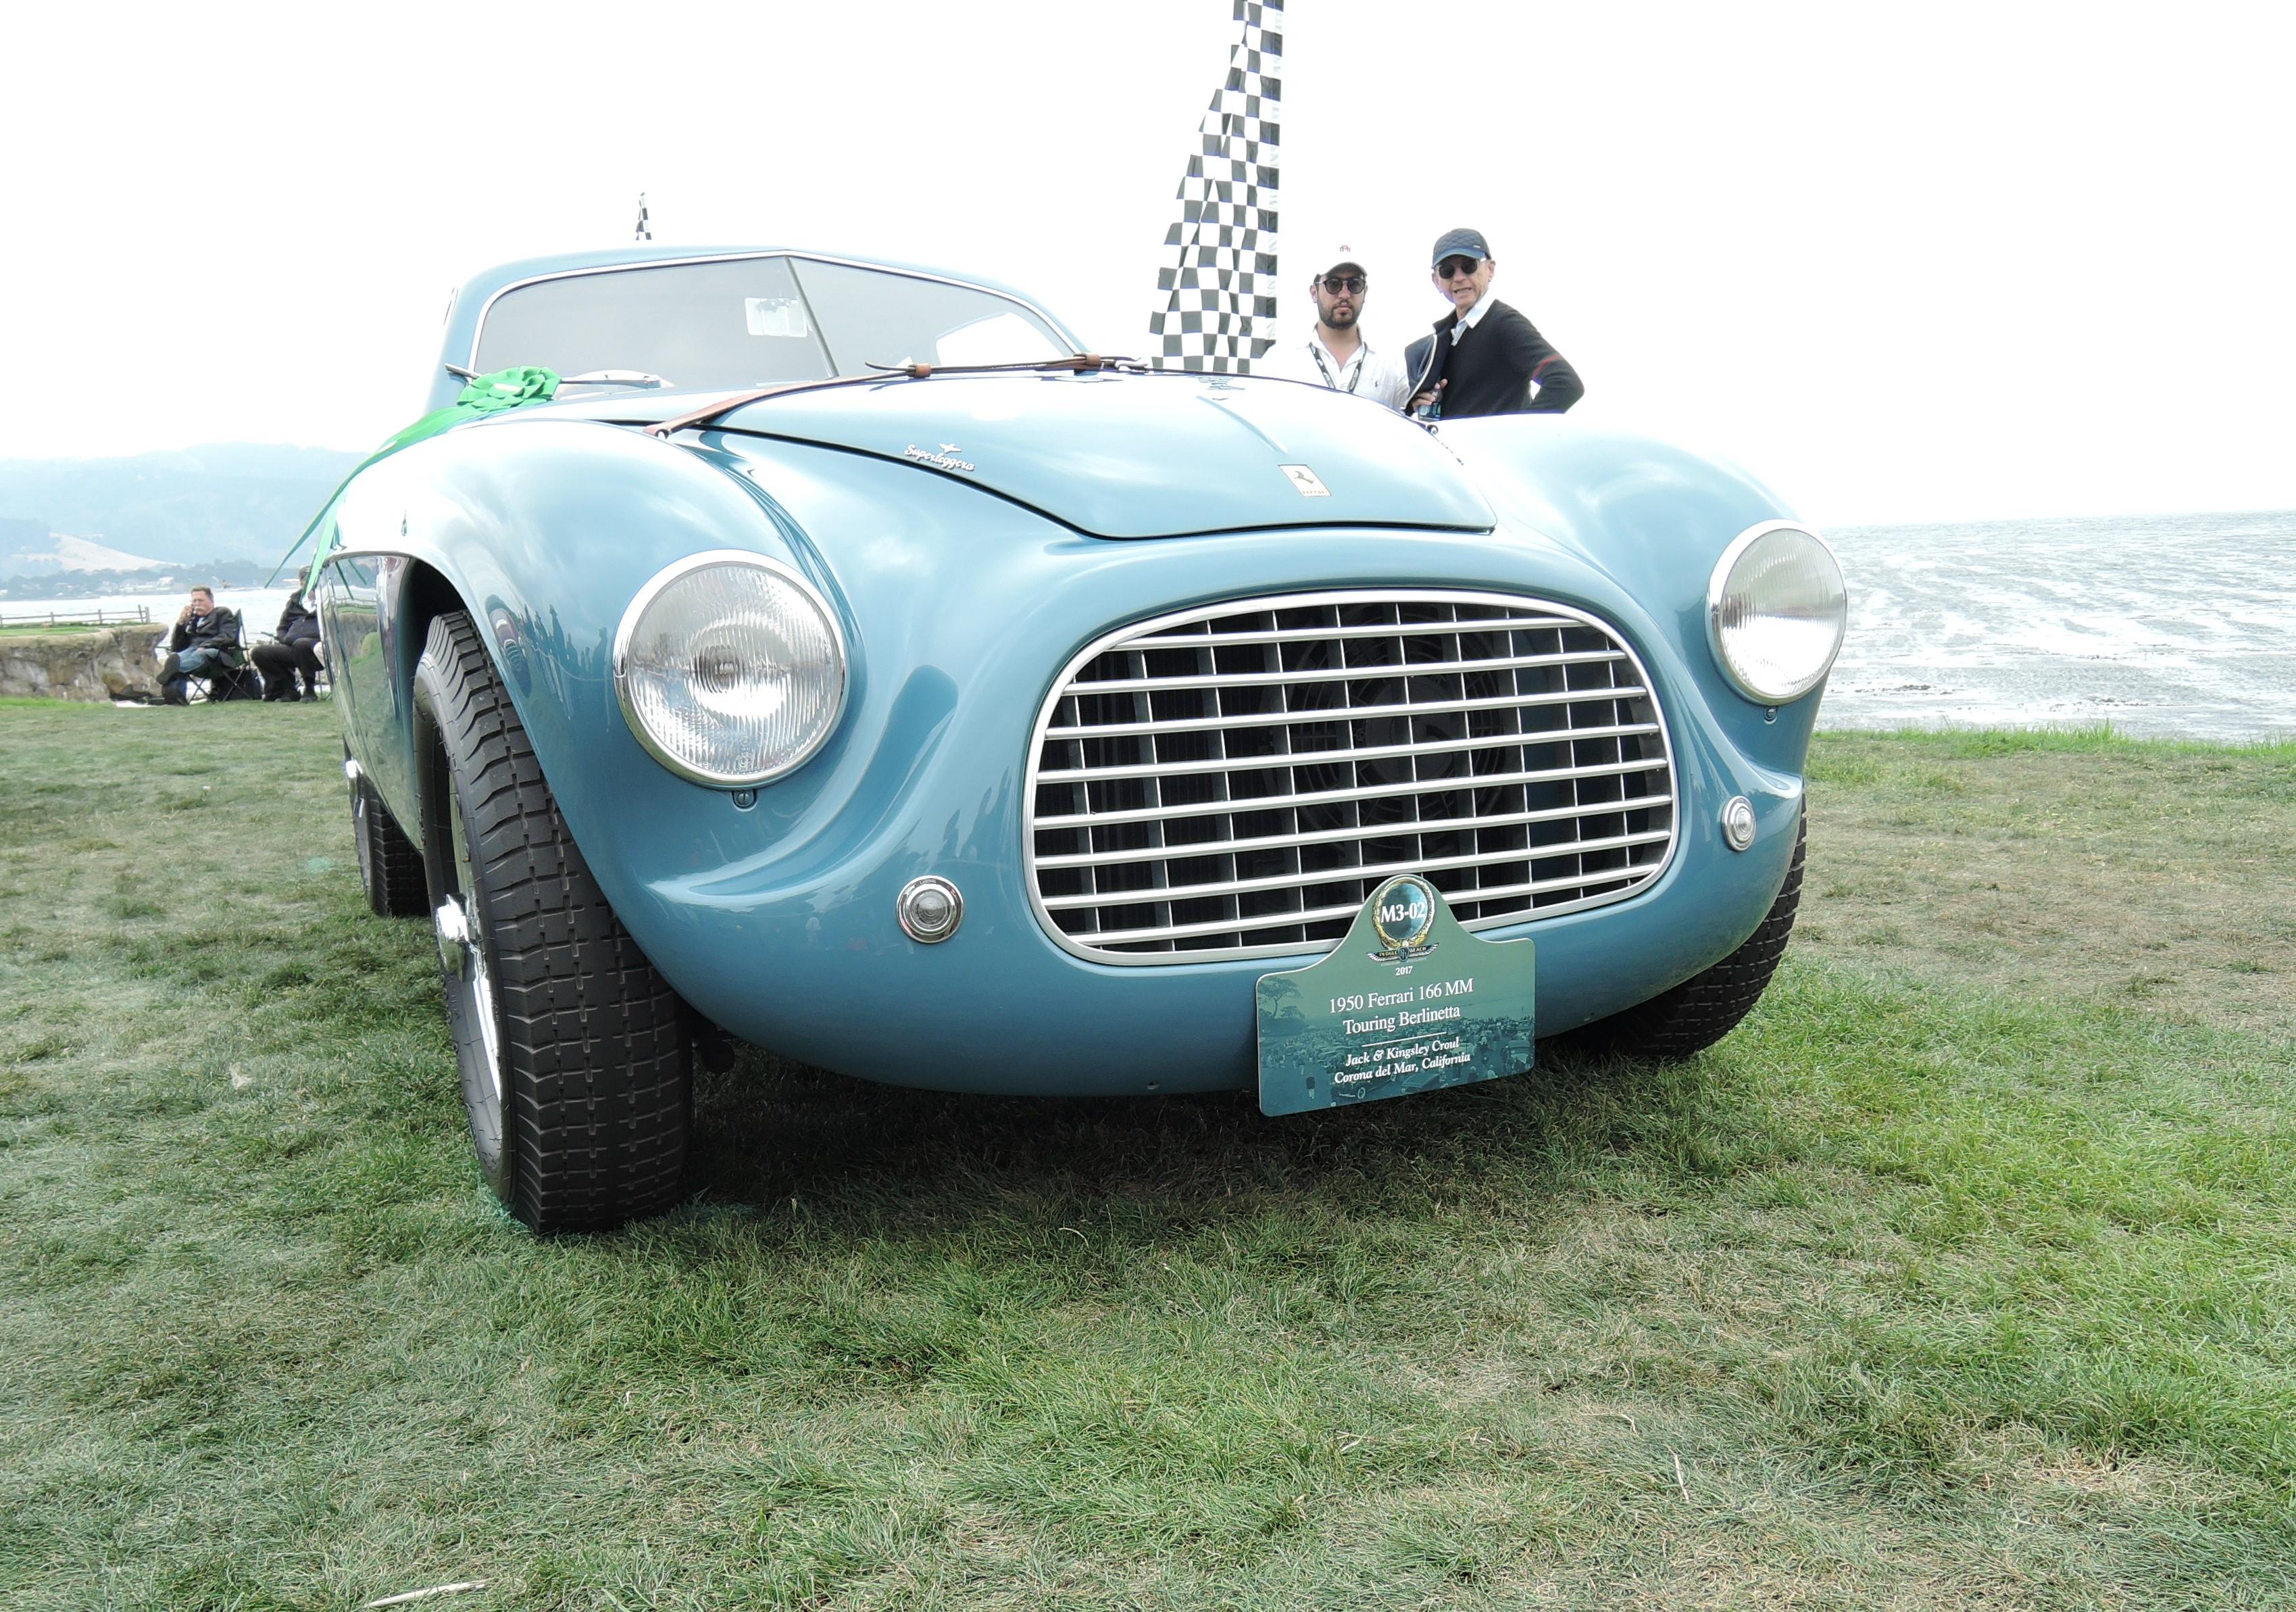 blue 1950 Ferrari 166 MM Sn 0026 - Pebble Beach Concours d'Elegance 2017